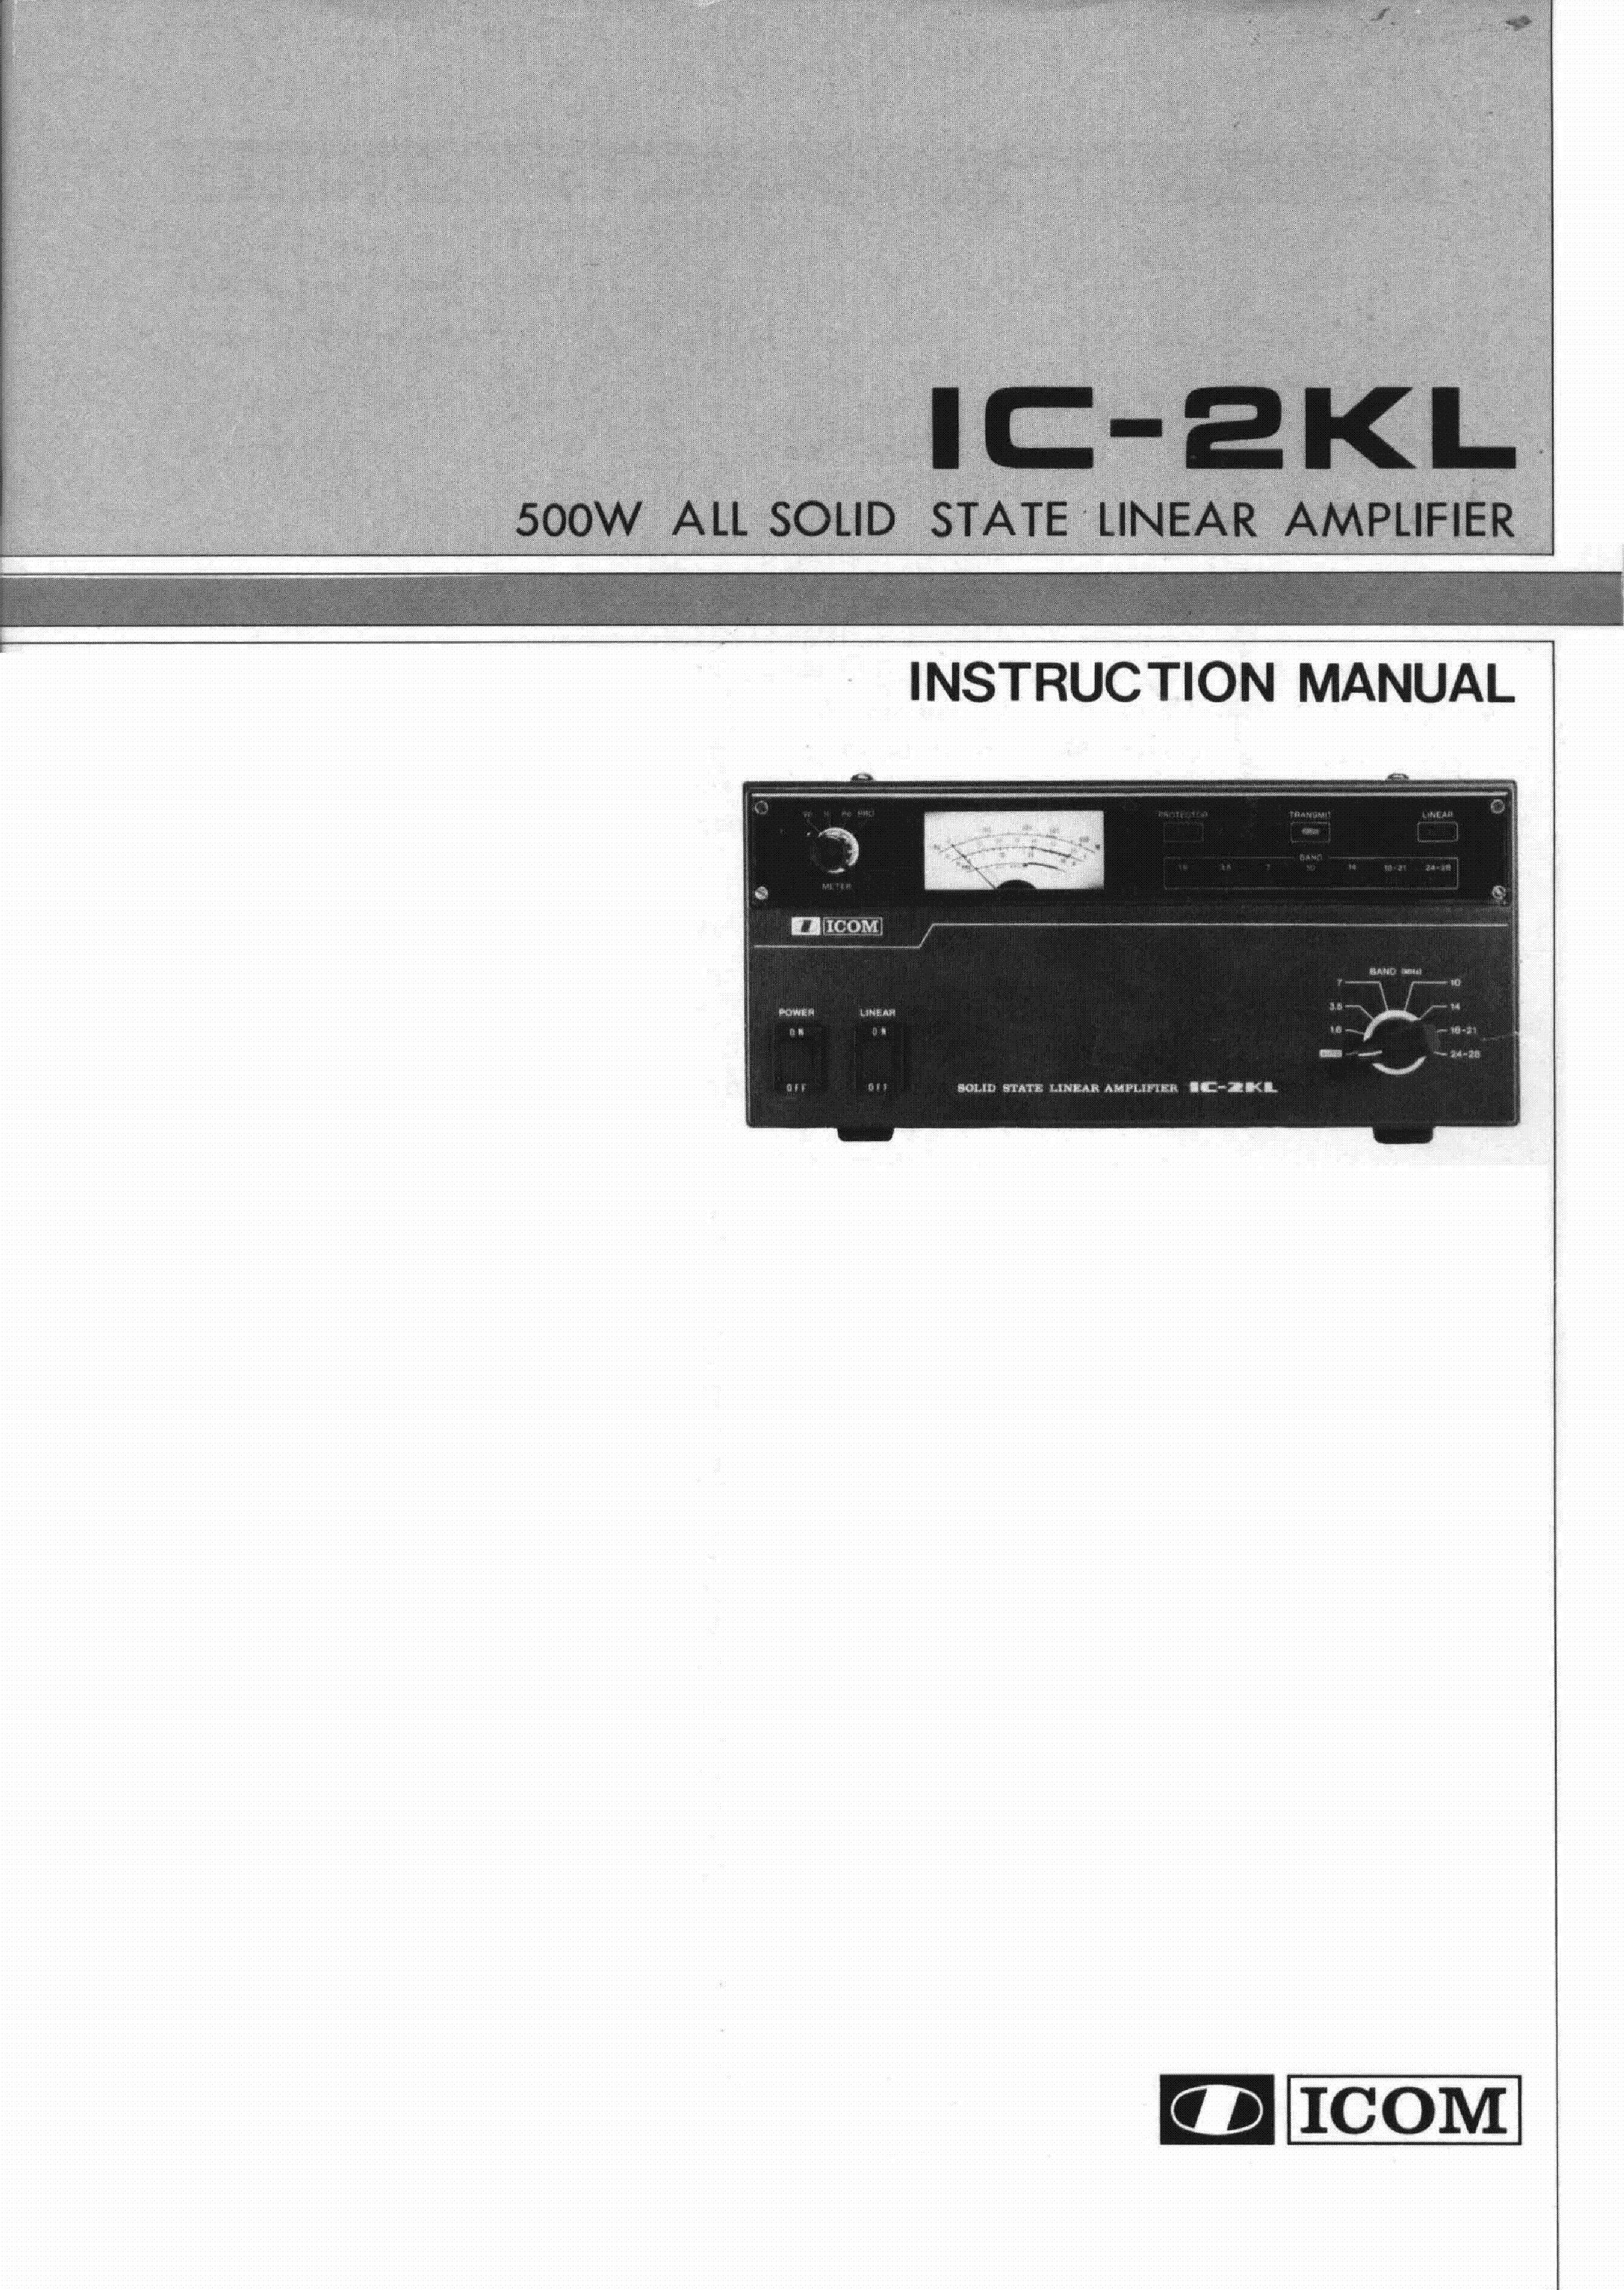 millwright manual of instruction pdf